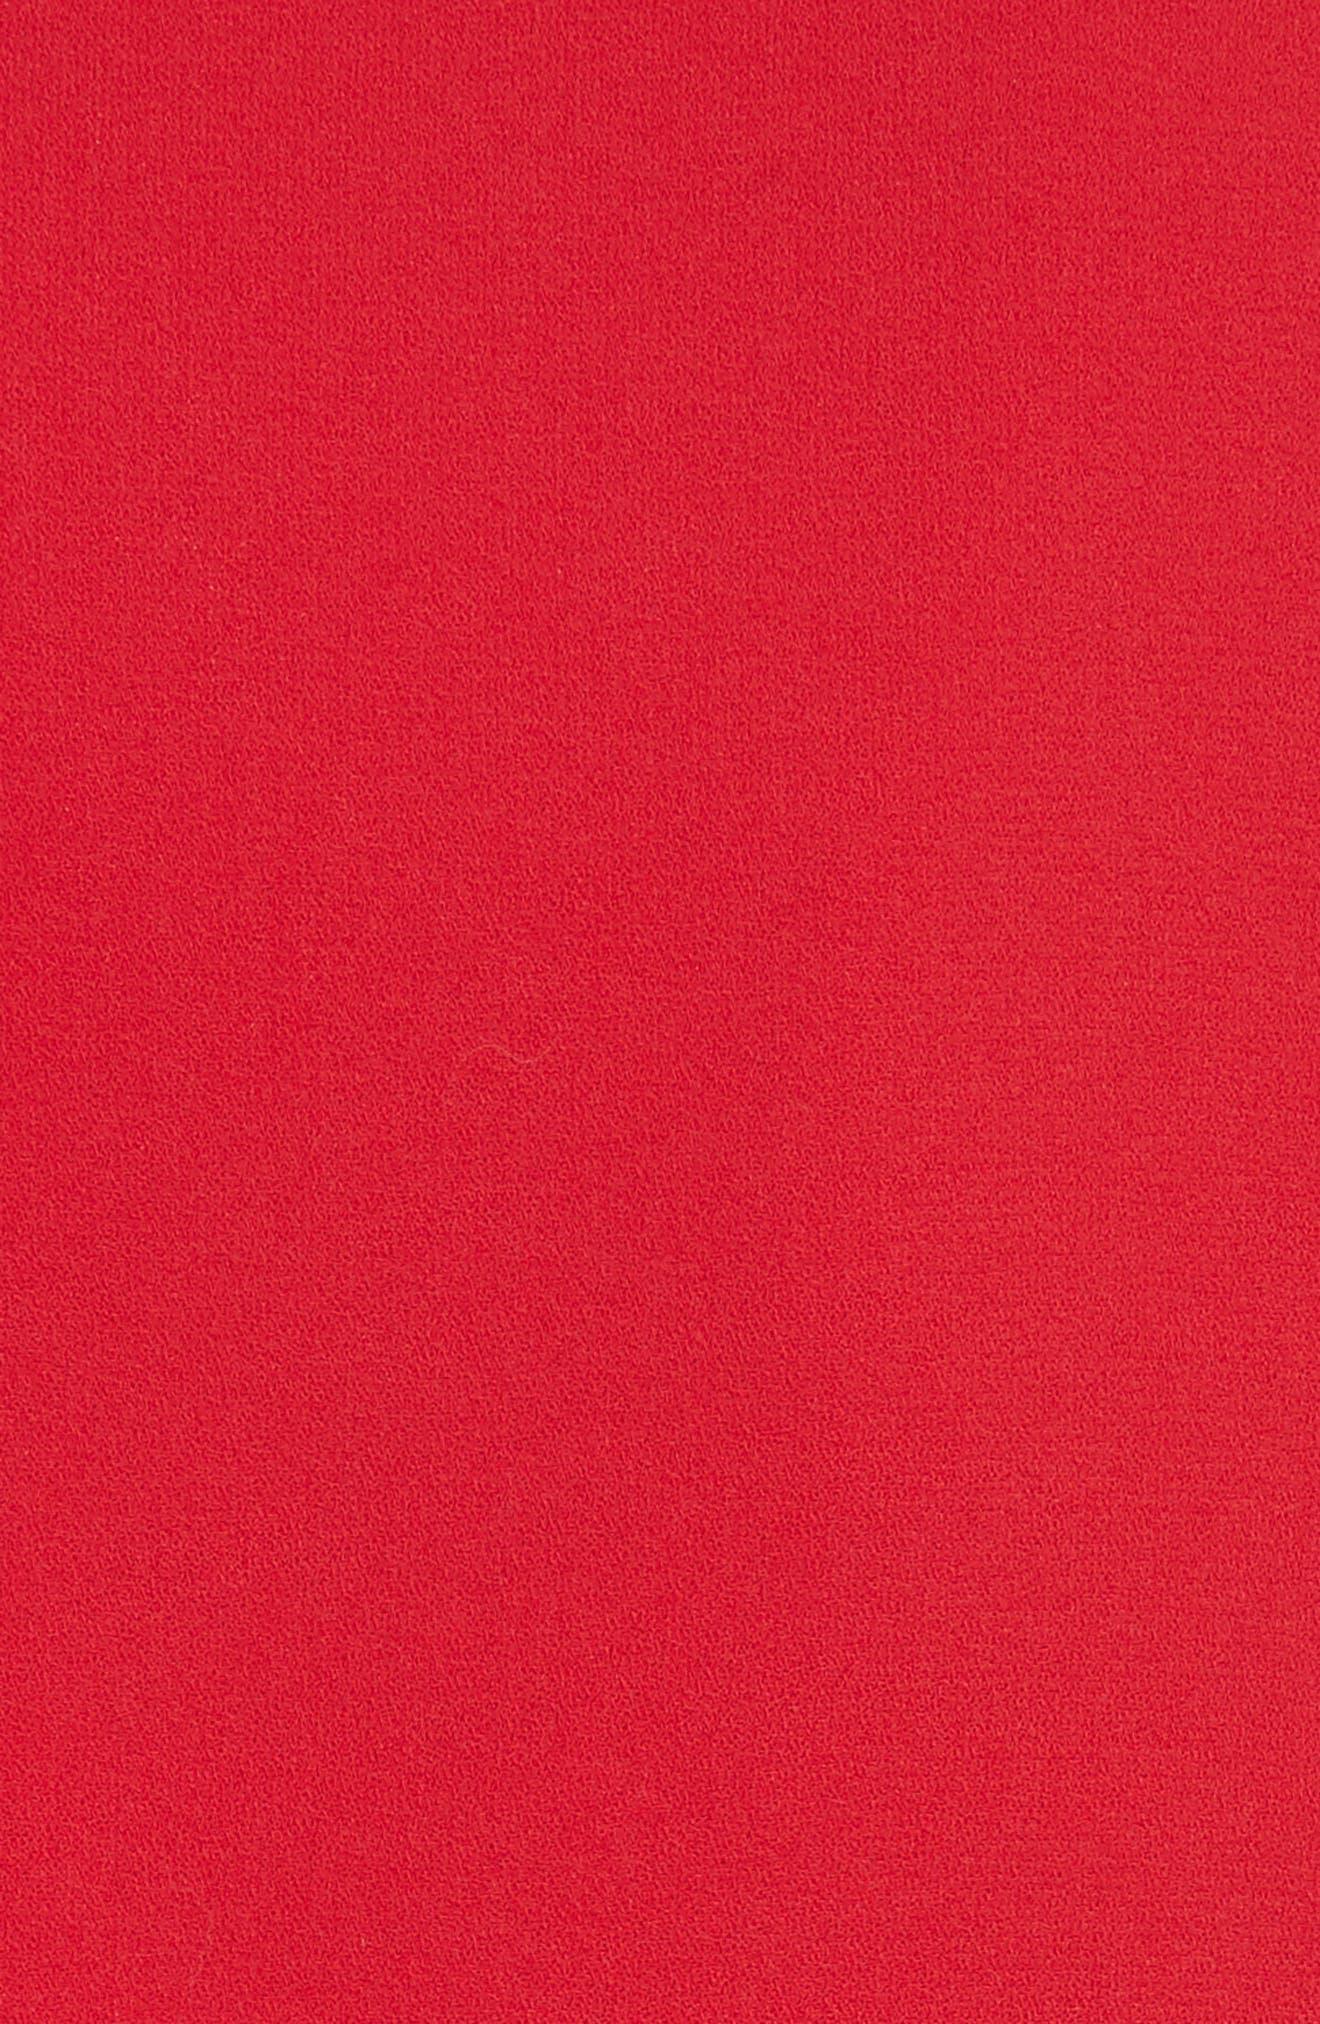 Coley Cold Shoulder A-Line Dress,                             Alternate thumbnail 5, color,                             623